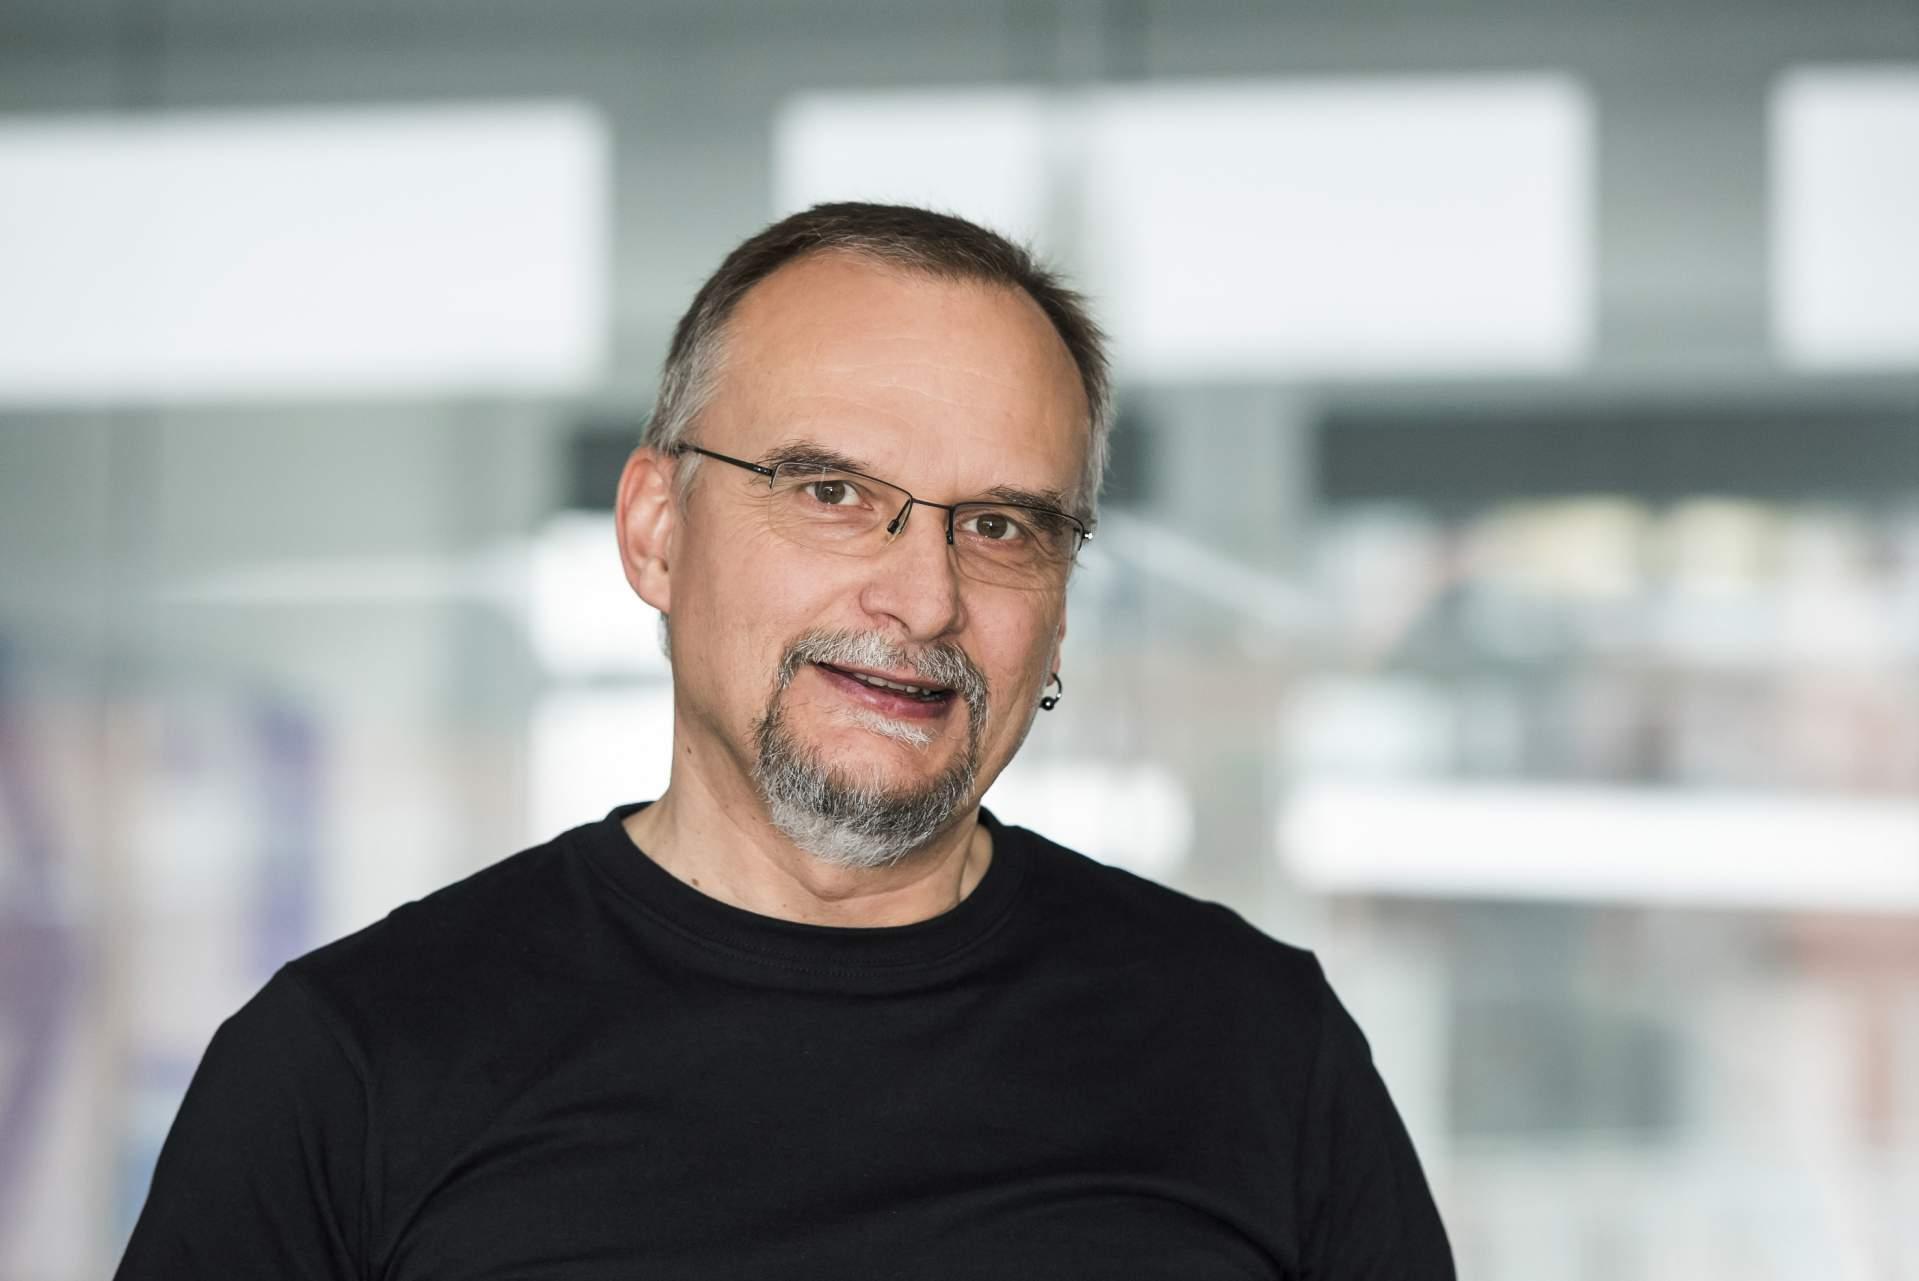 Portrait von Jörg-Peter Walkenhorst